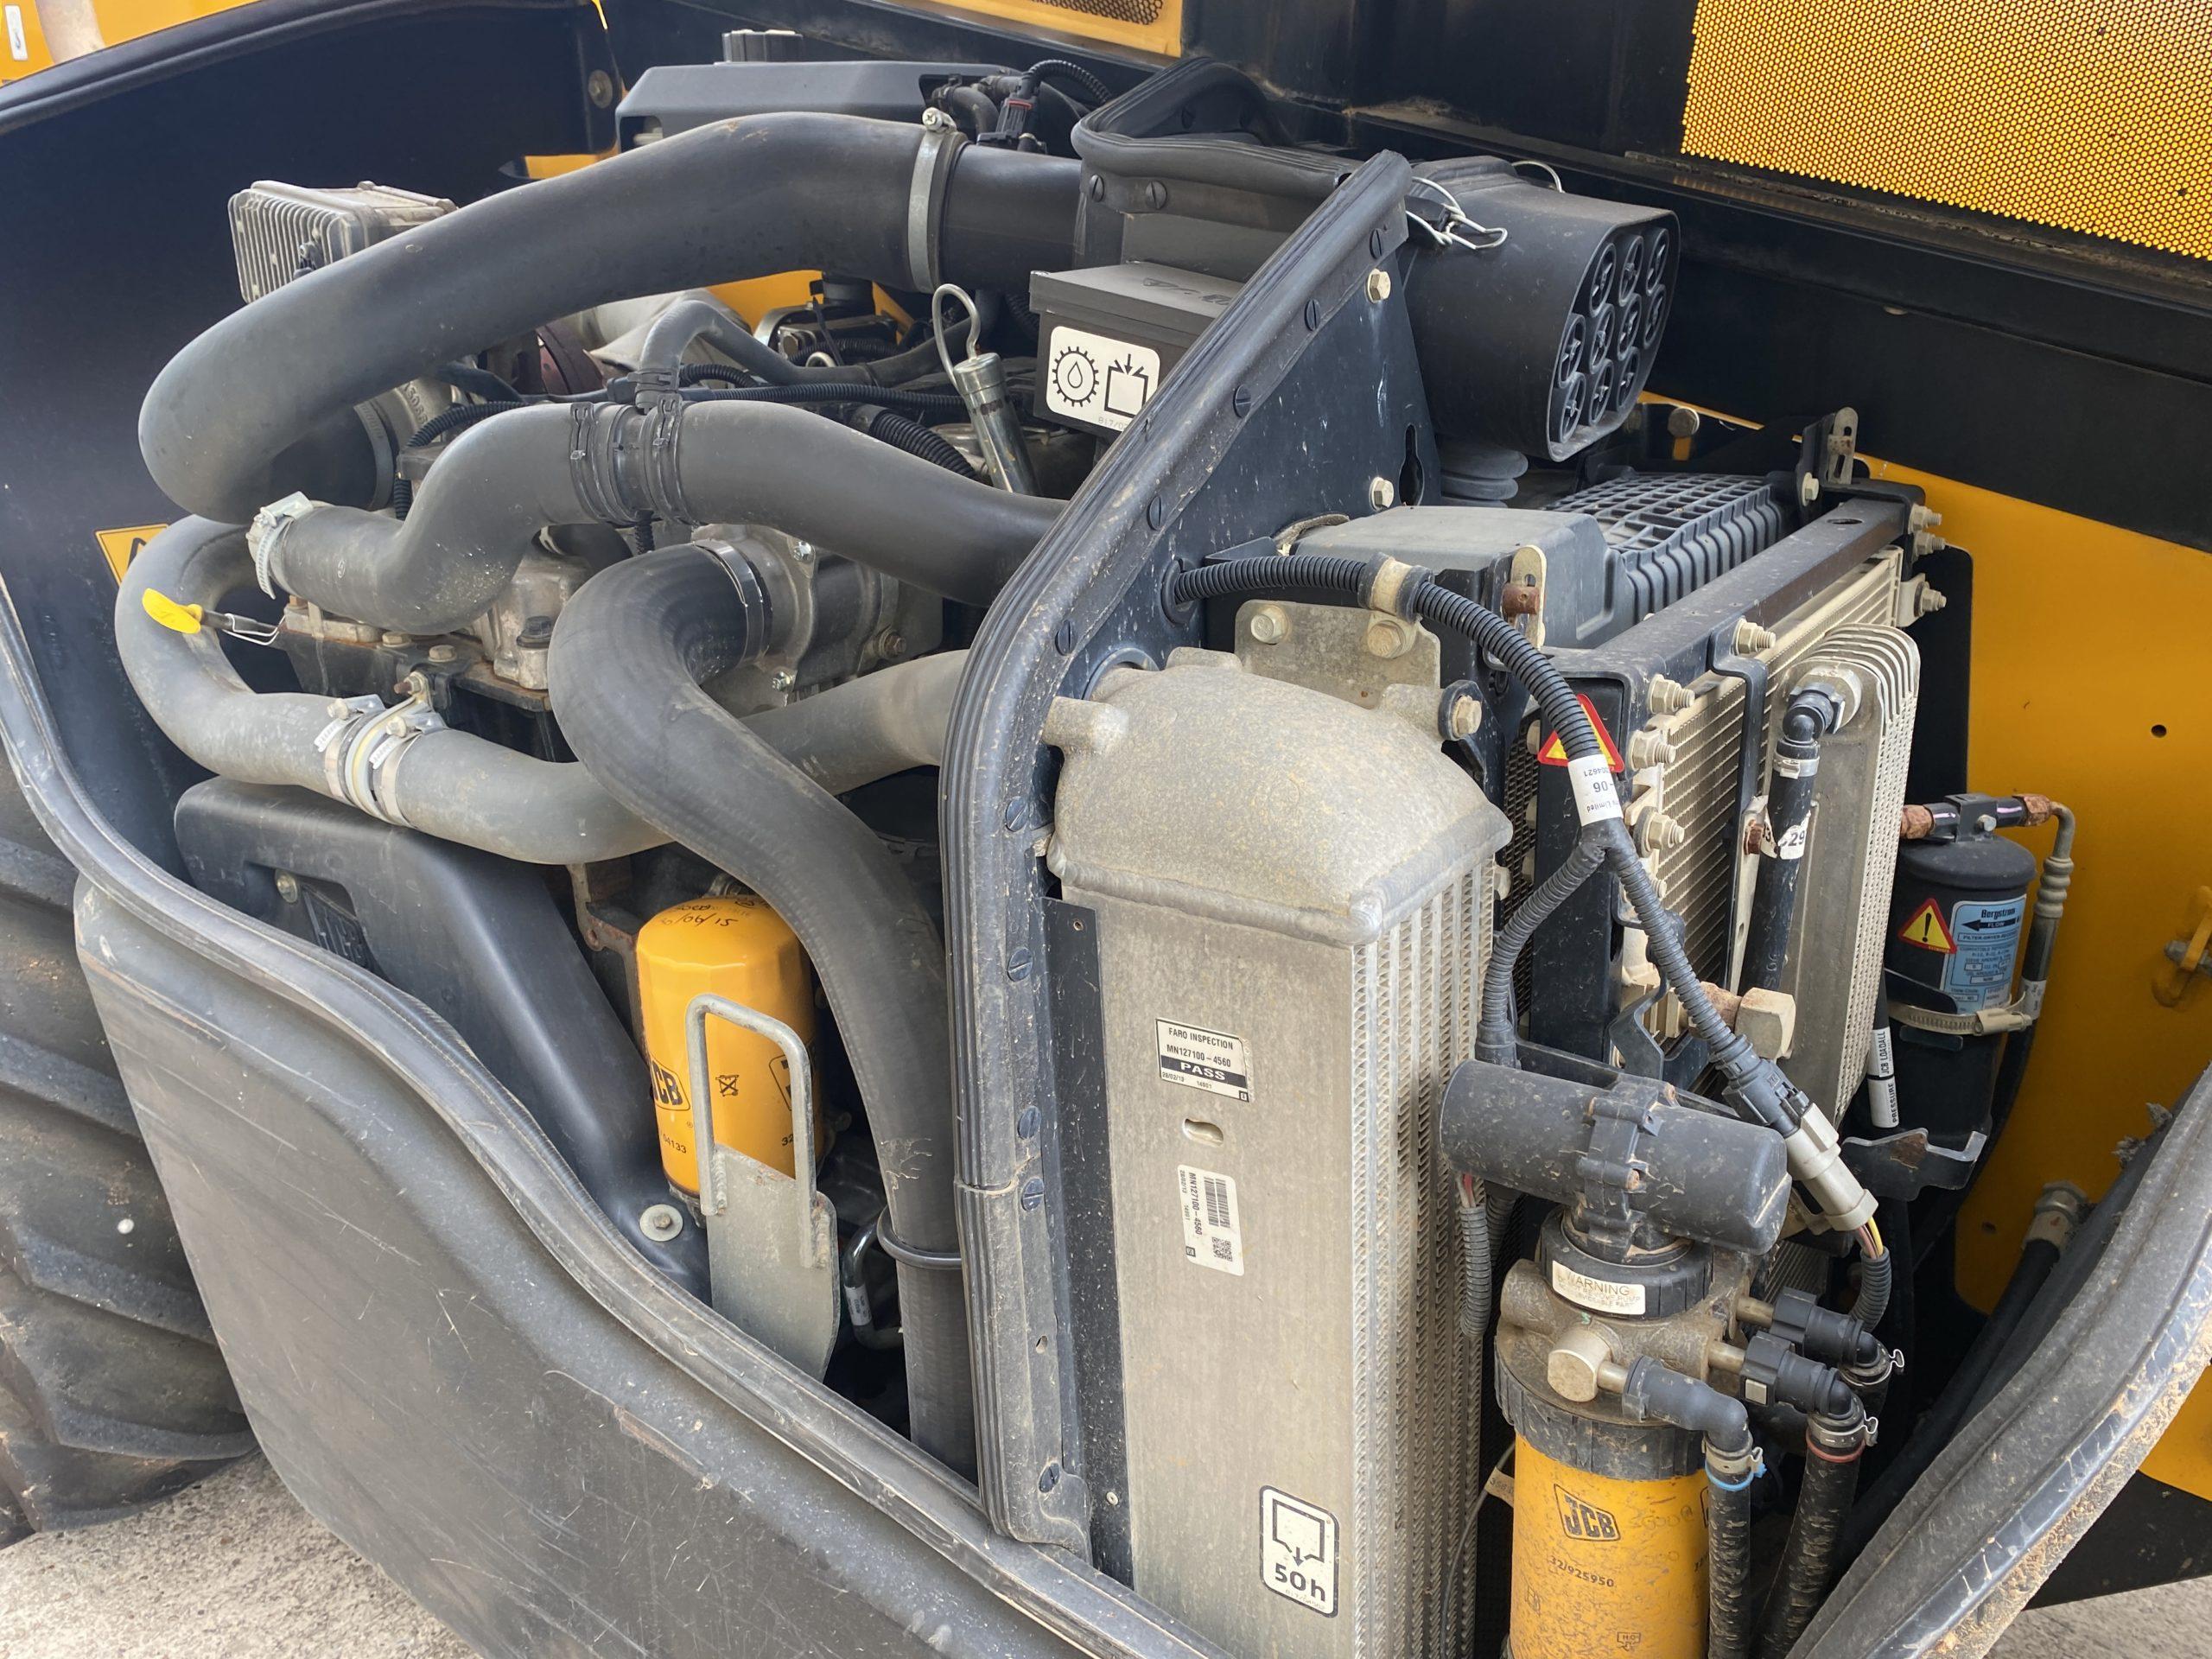 JCB 535-140 HI VIZ Teleporter   used military vehicles, MOD surplus for sale